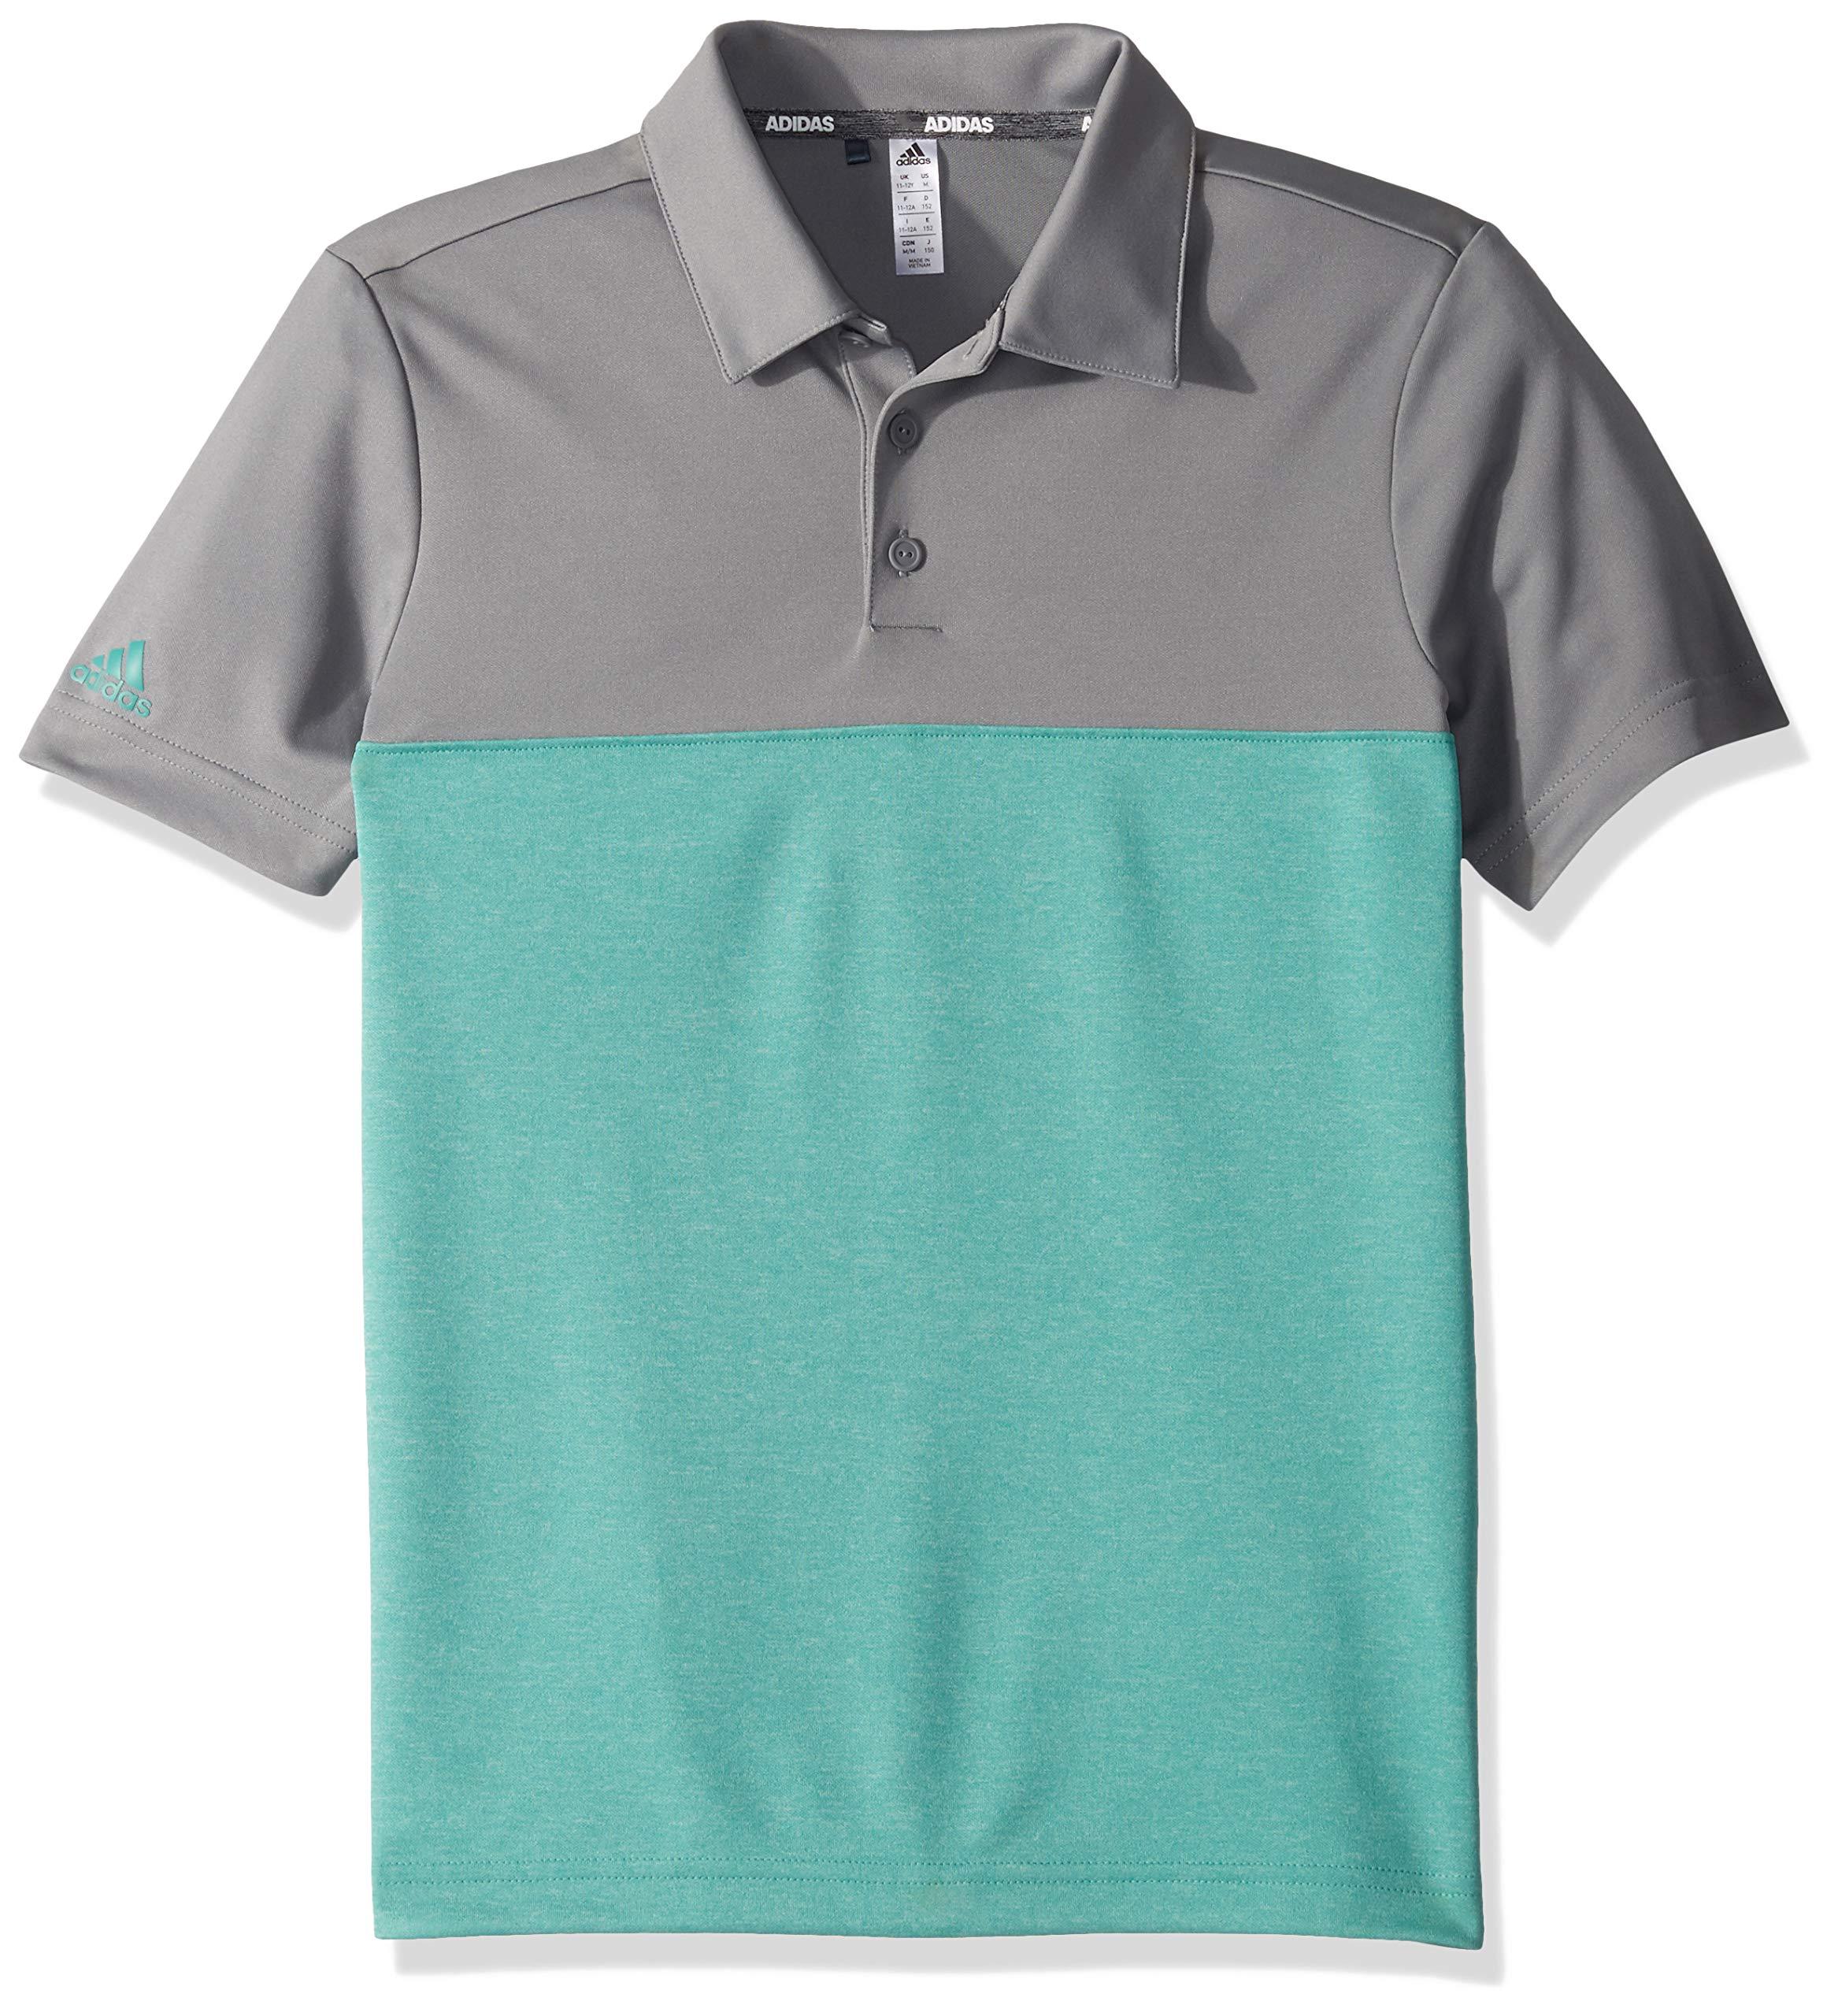 adidas Golf Heathered Color Blocked Polo, Grey Three/True Green Heather, Small by adidas